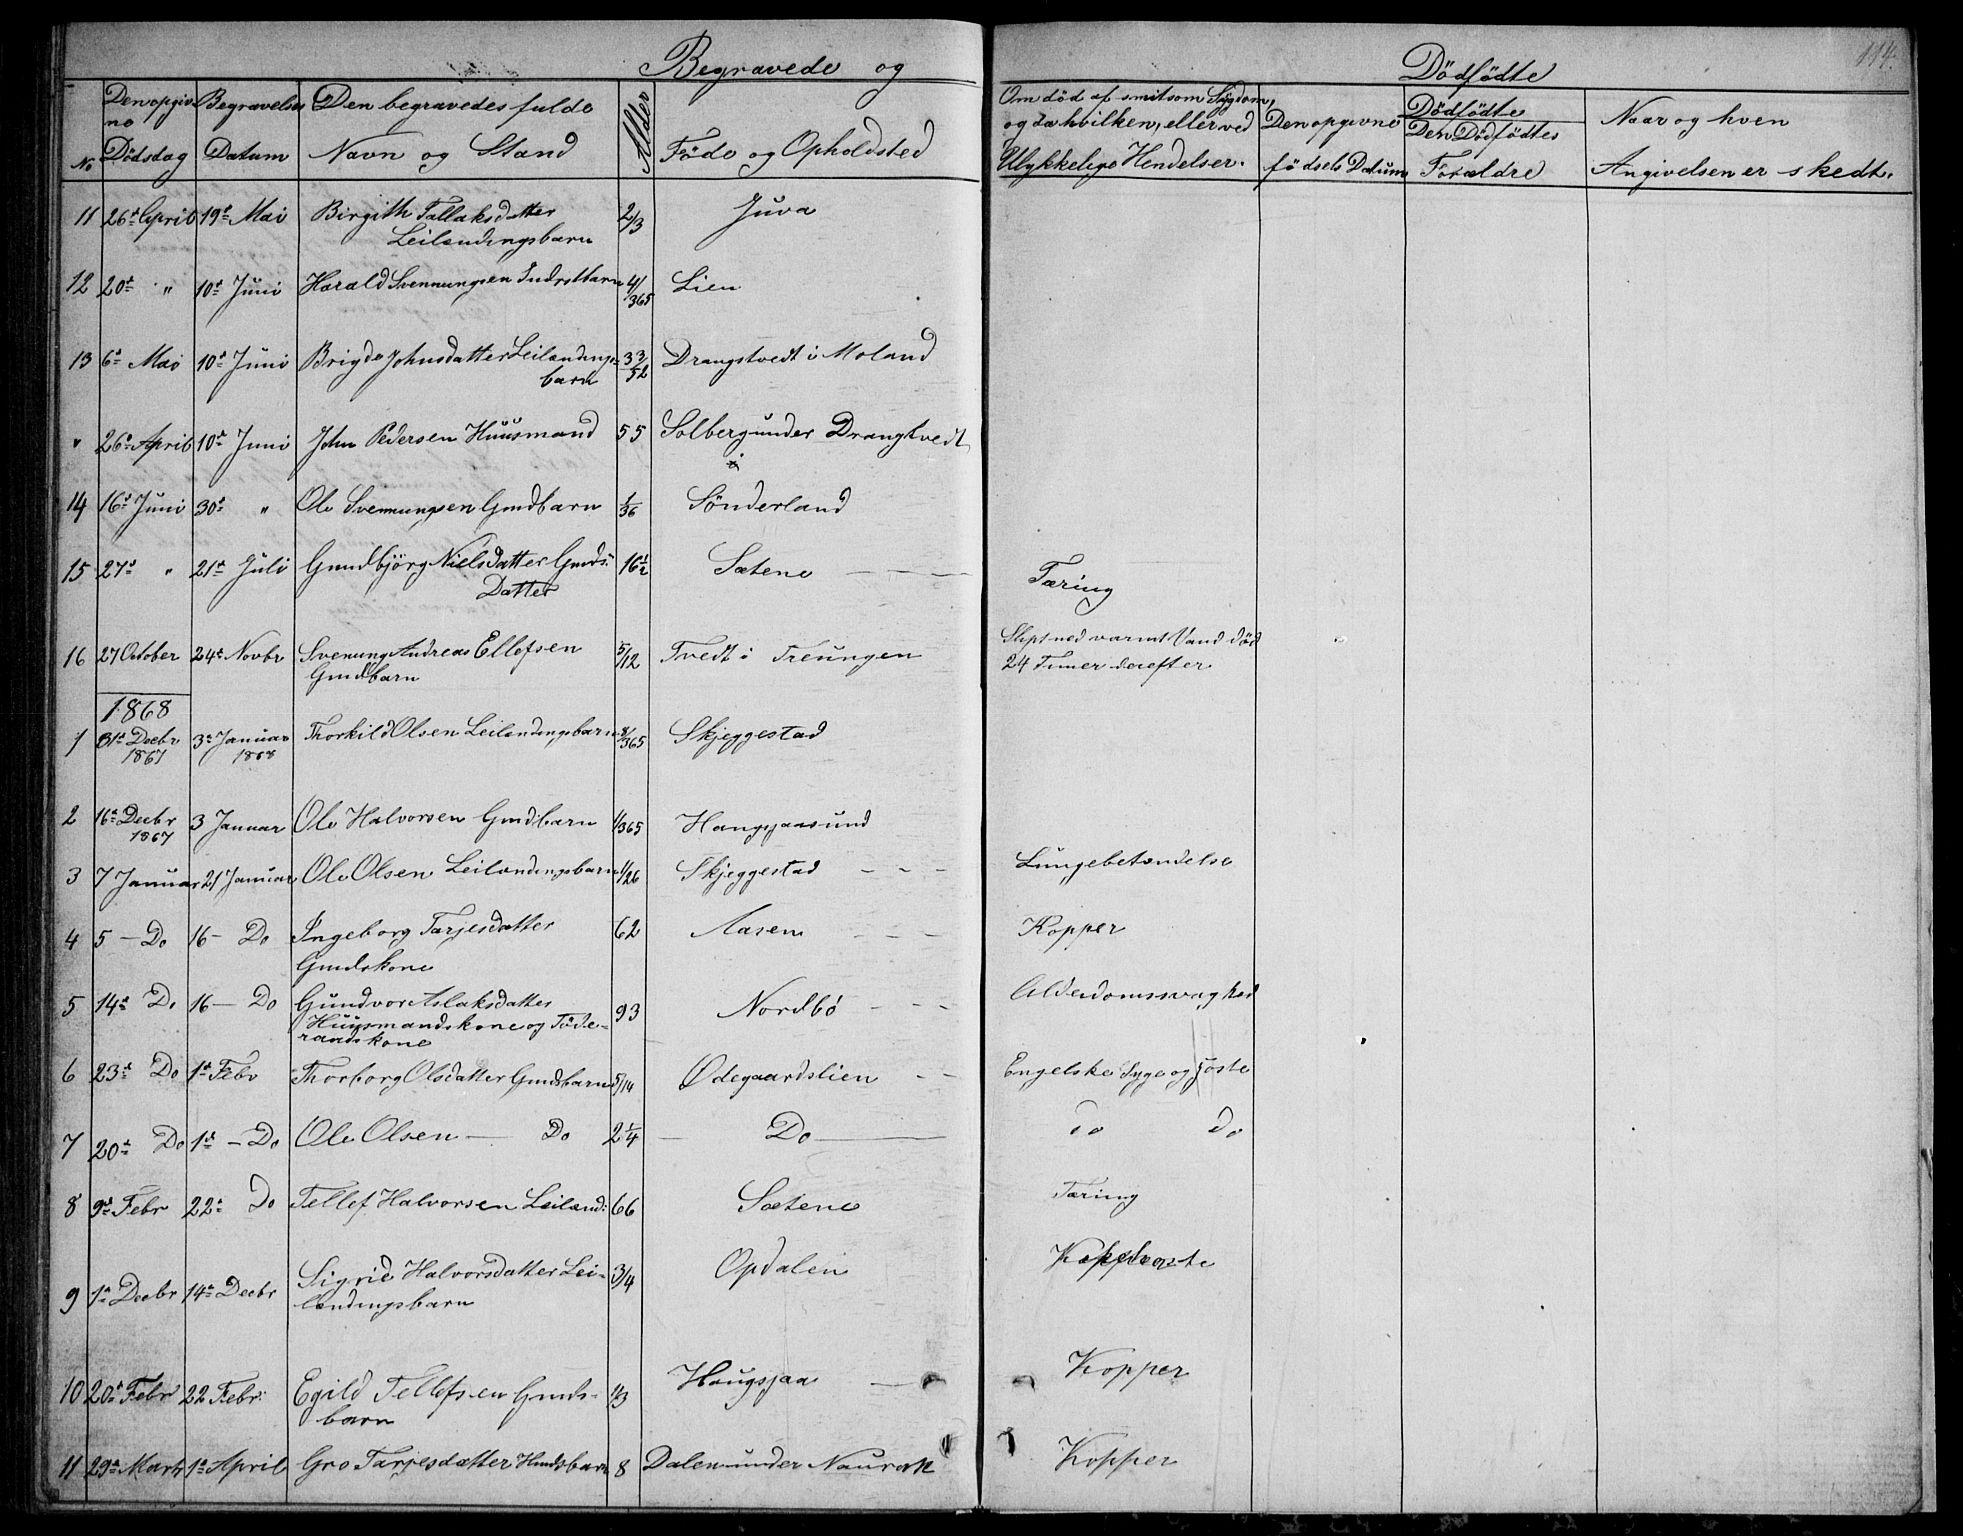 SAKO, Nissedal kirkebøker, G/Gb/L0002: Klokkerbok nr. II 2, 1863-1892, s. 114